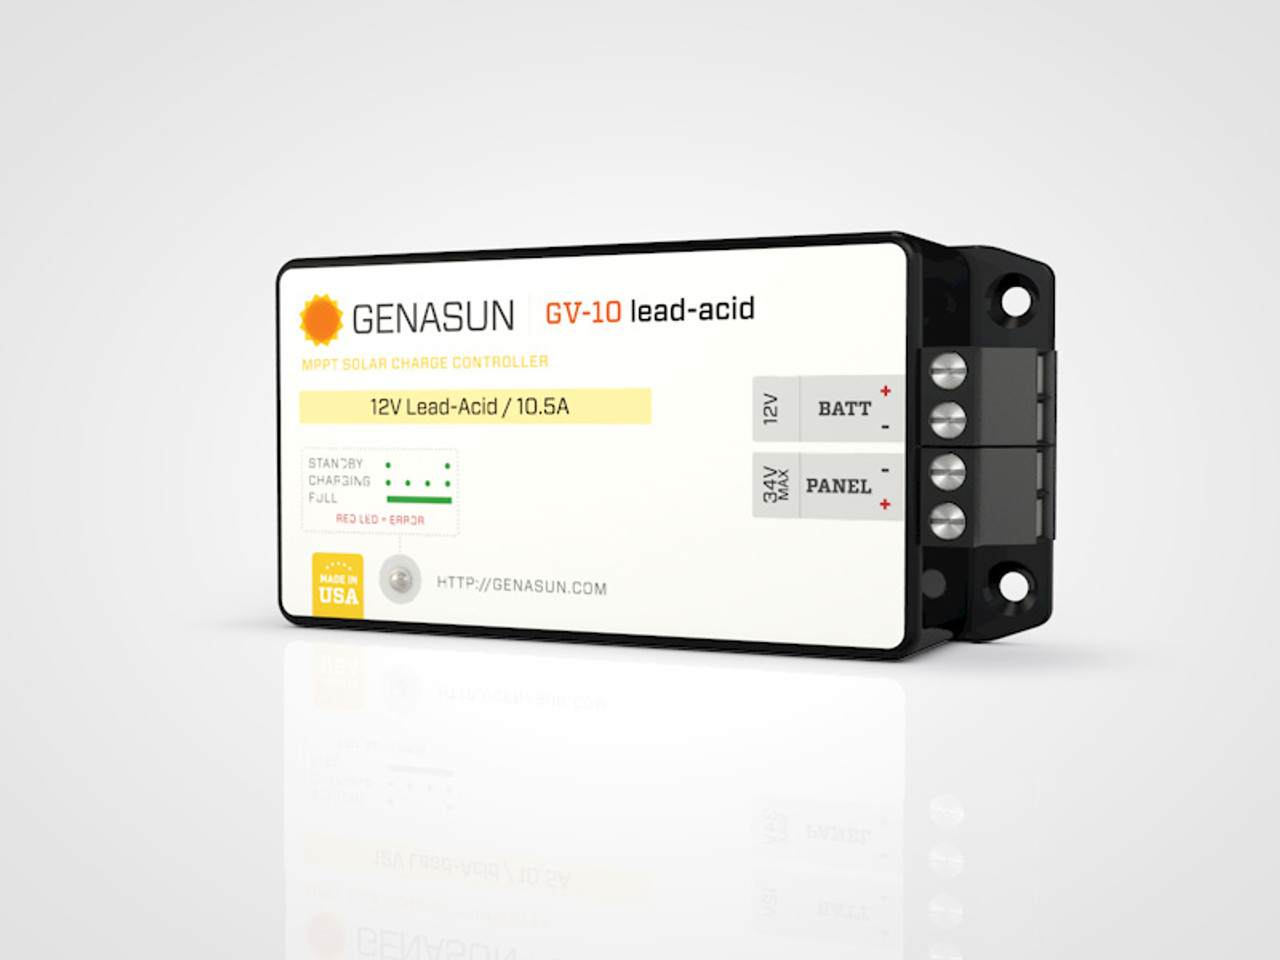 GV-10 | 140W 10.5A Genasun MPPT Solar Charge Controller - Pb - Right1